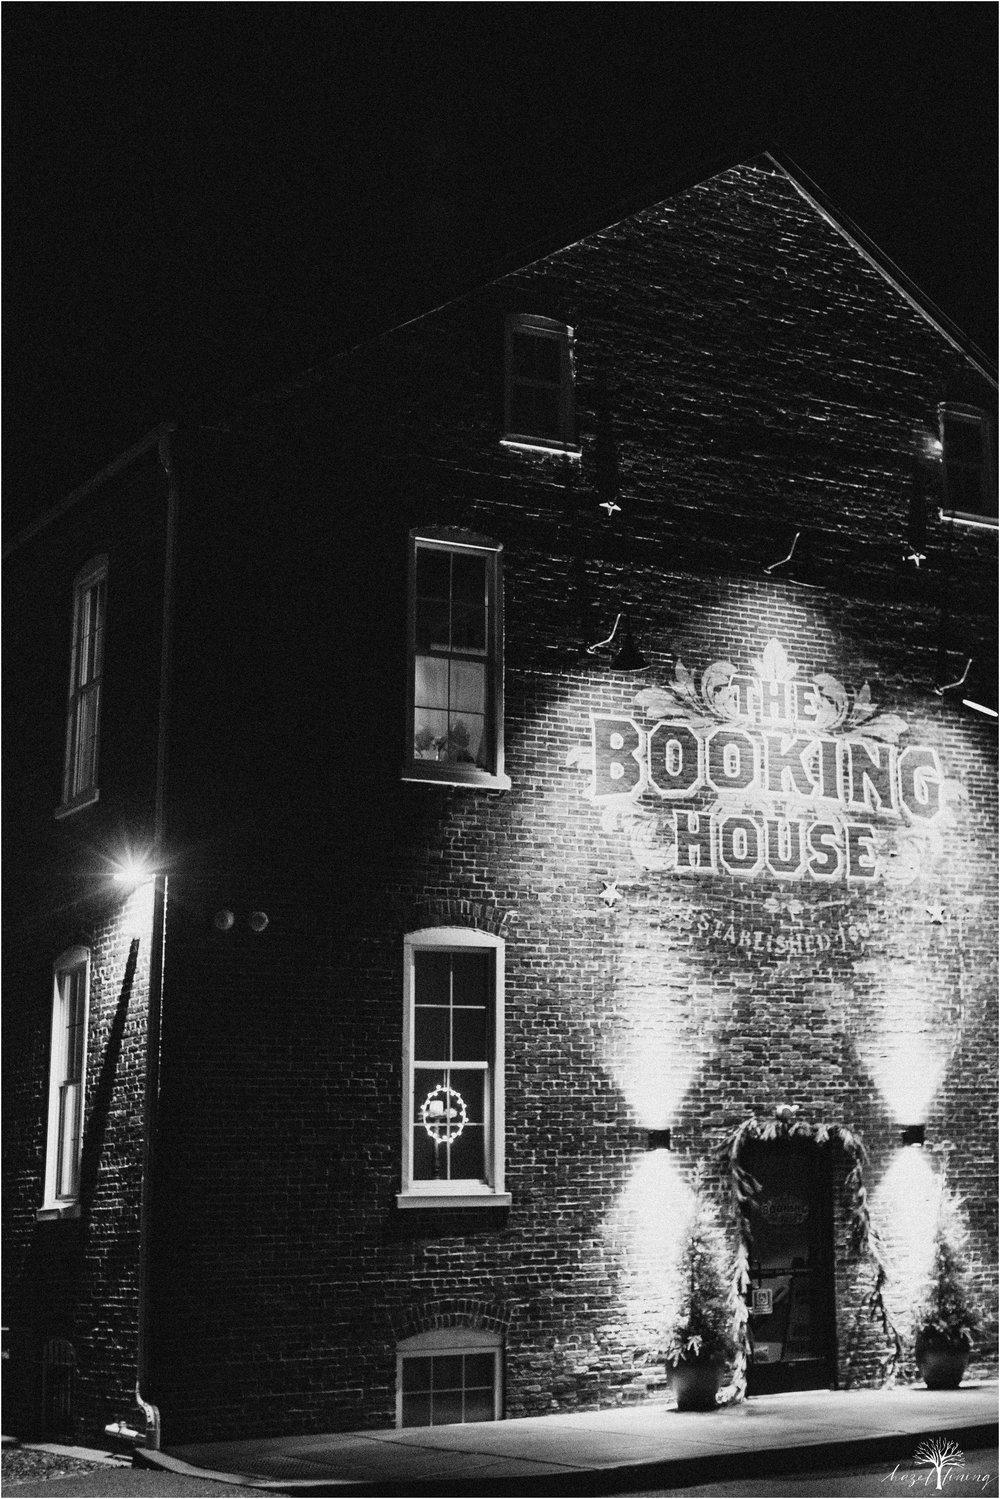 emma-matt-gehringer-the-booking-house-lancaster-manhiem-pennsylvania-winter-wedding_0205.jpg